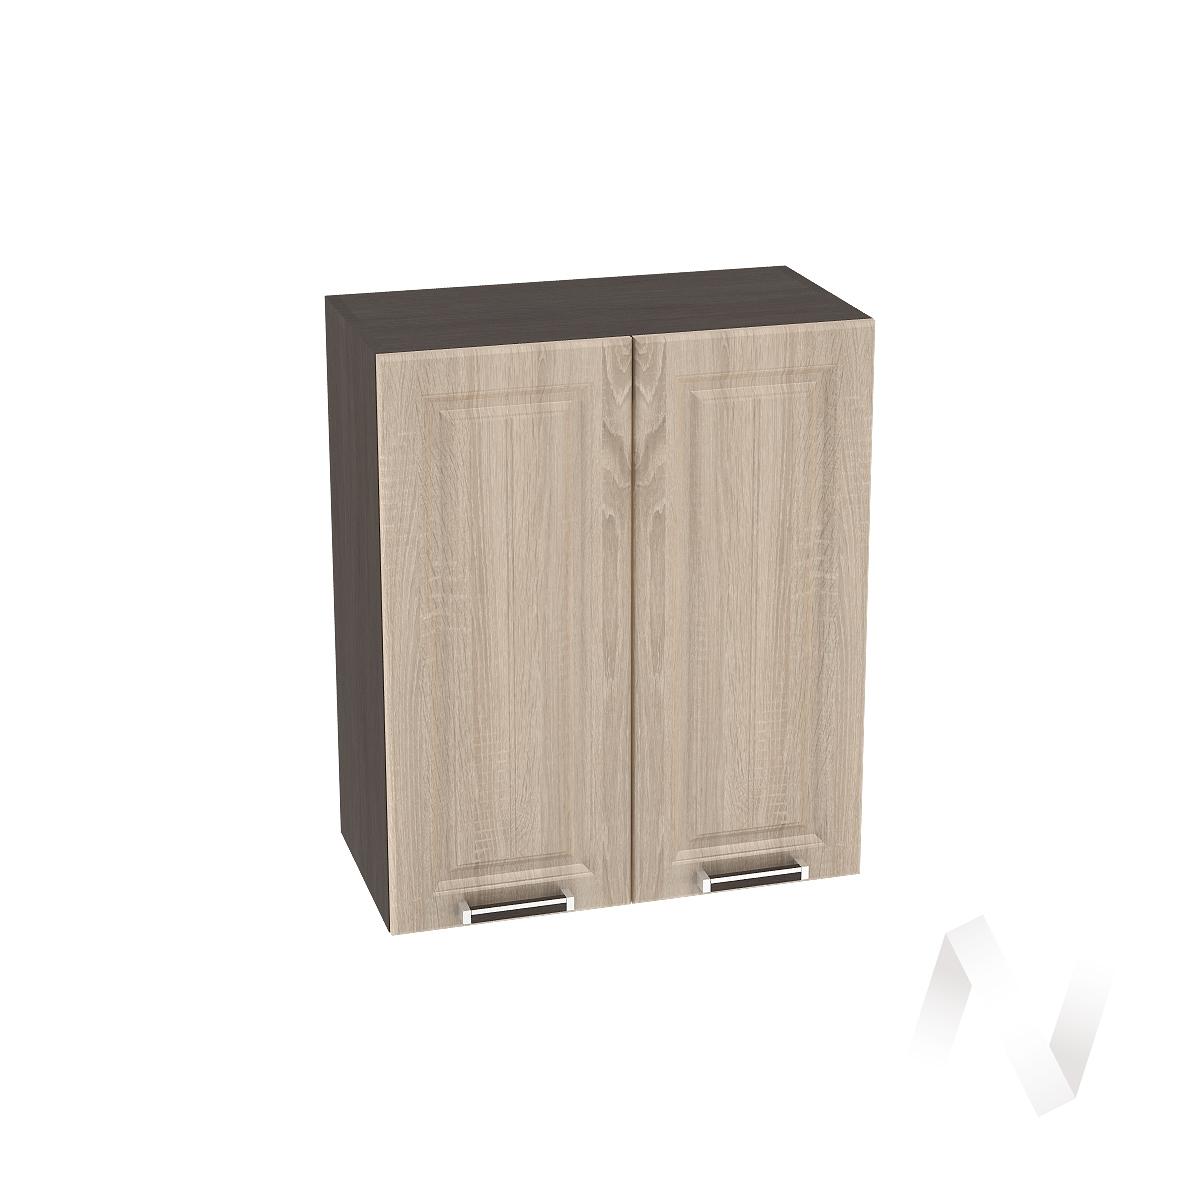 "Кухня ""Прага"": Шкаф верхний 600, ШВ 600 (дуб сонома/корпус венге)"